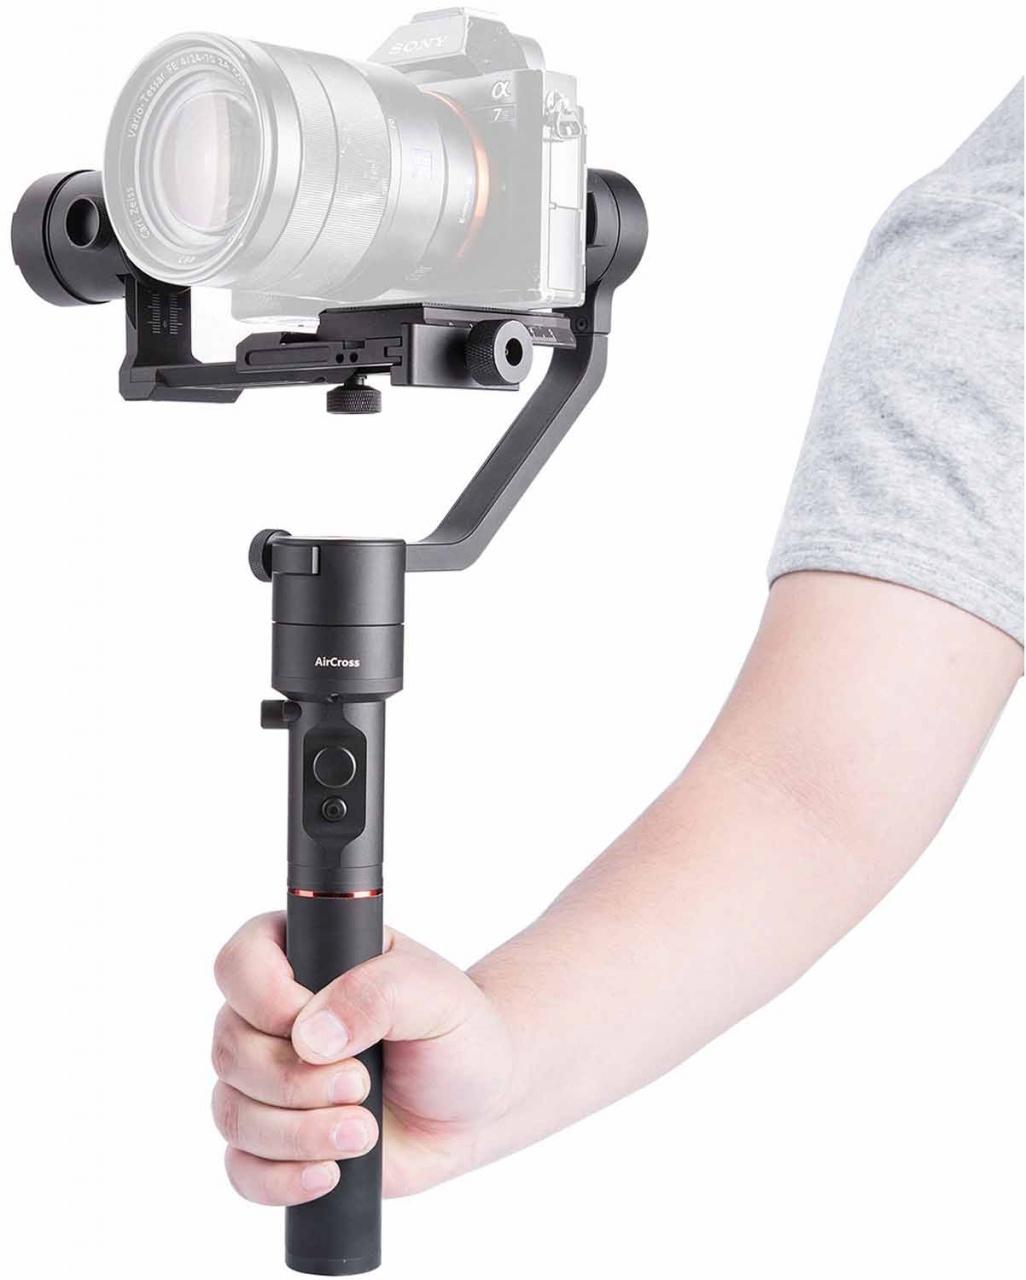 MOZA AIRCROSS Gimbal stabilizátor pro fotoaparáty